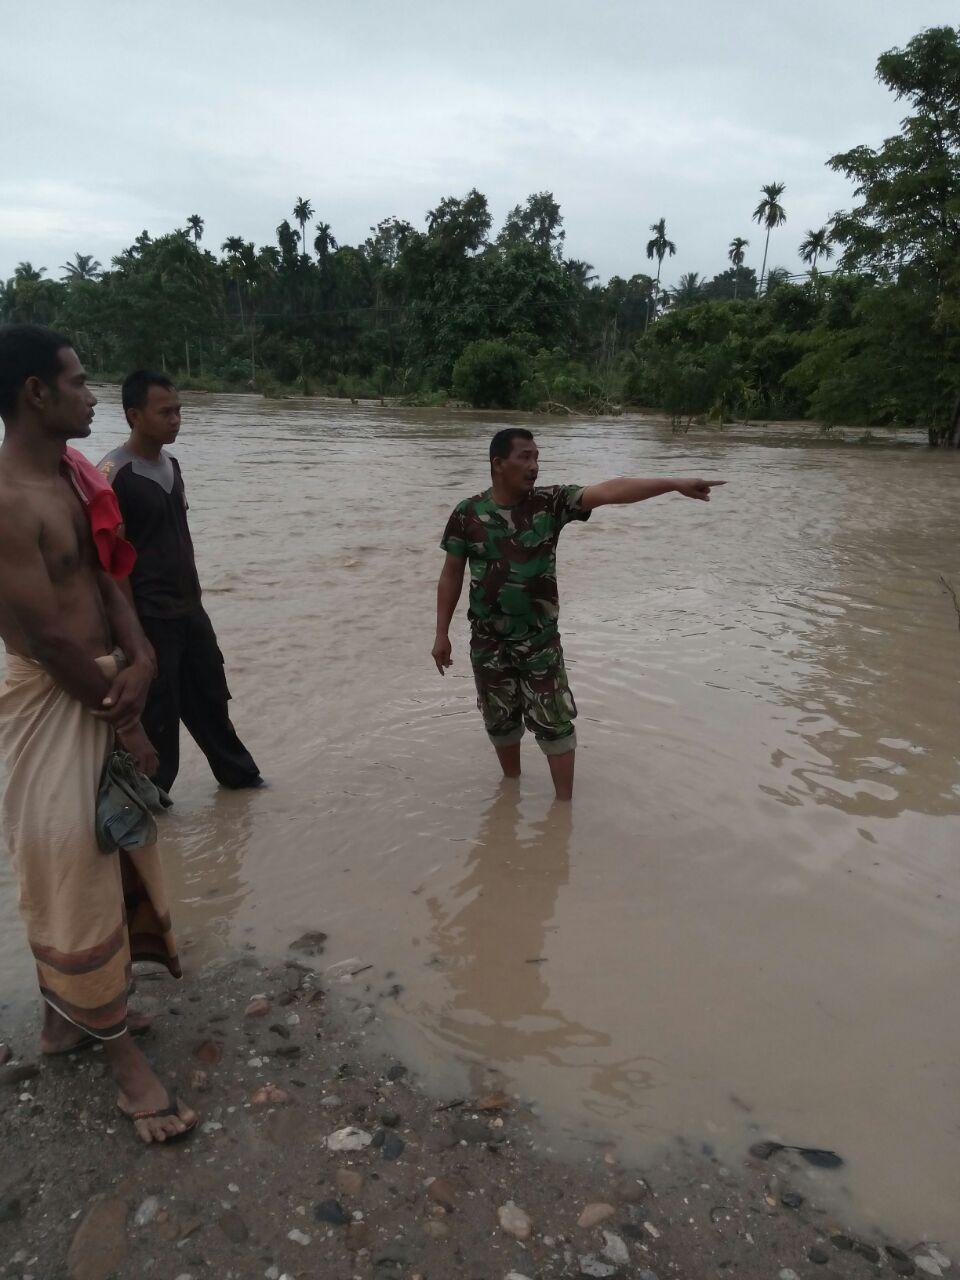 Banjir di Aceh Utara Kembali Datang, Ratusan Babinsa Disiagakan